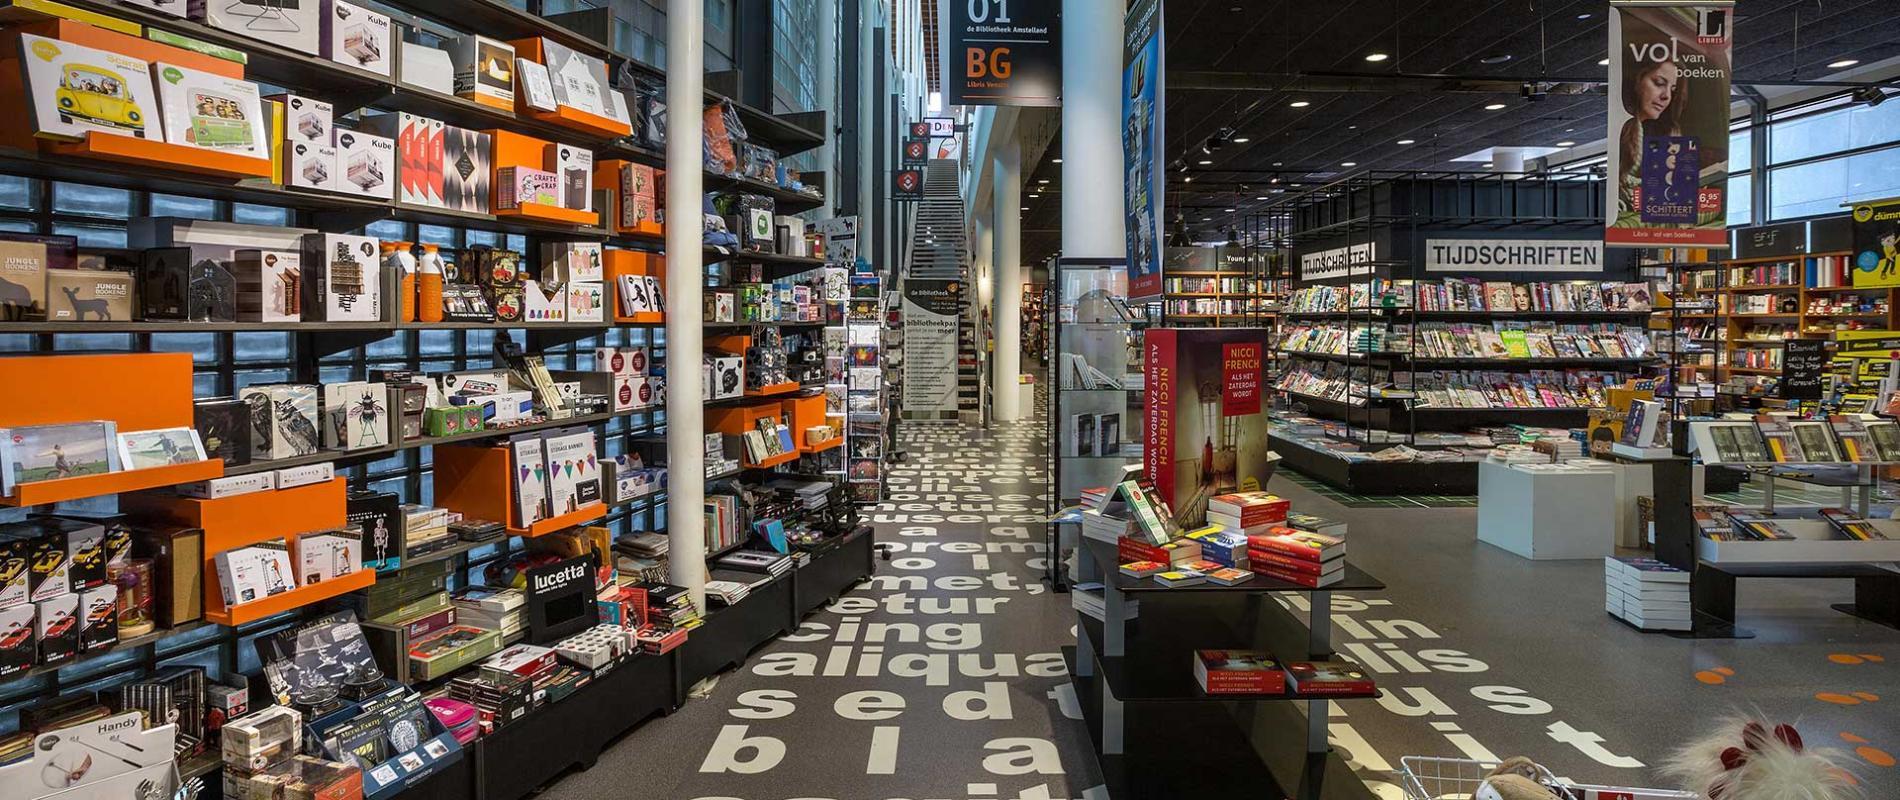 Libris Venstra Amstelveen Binnenbrand Brand Environment Design